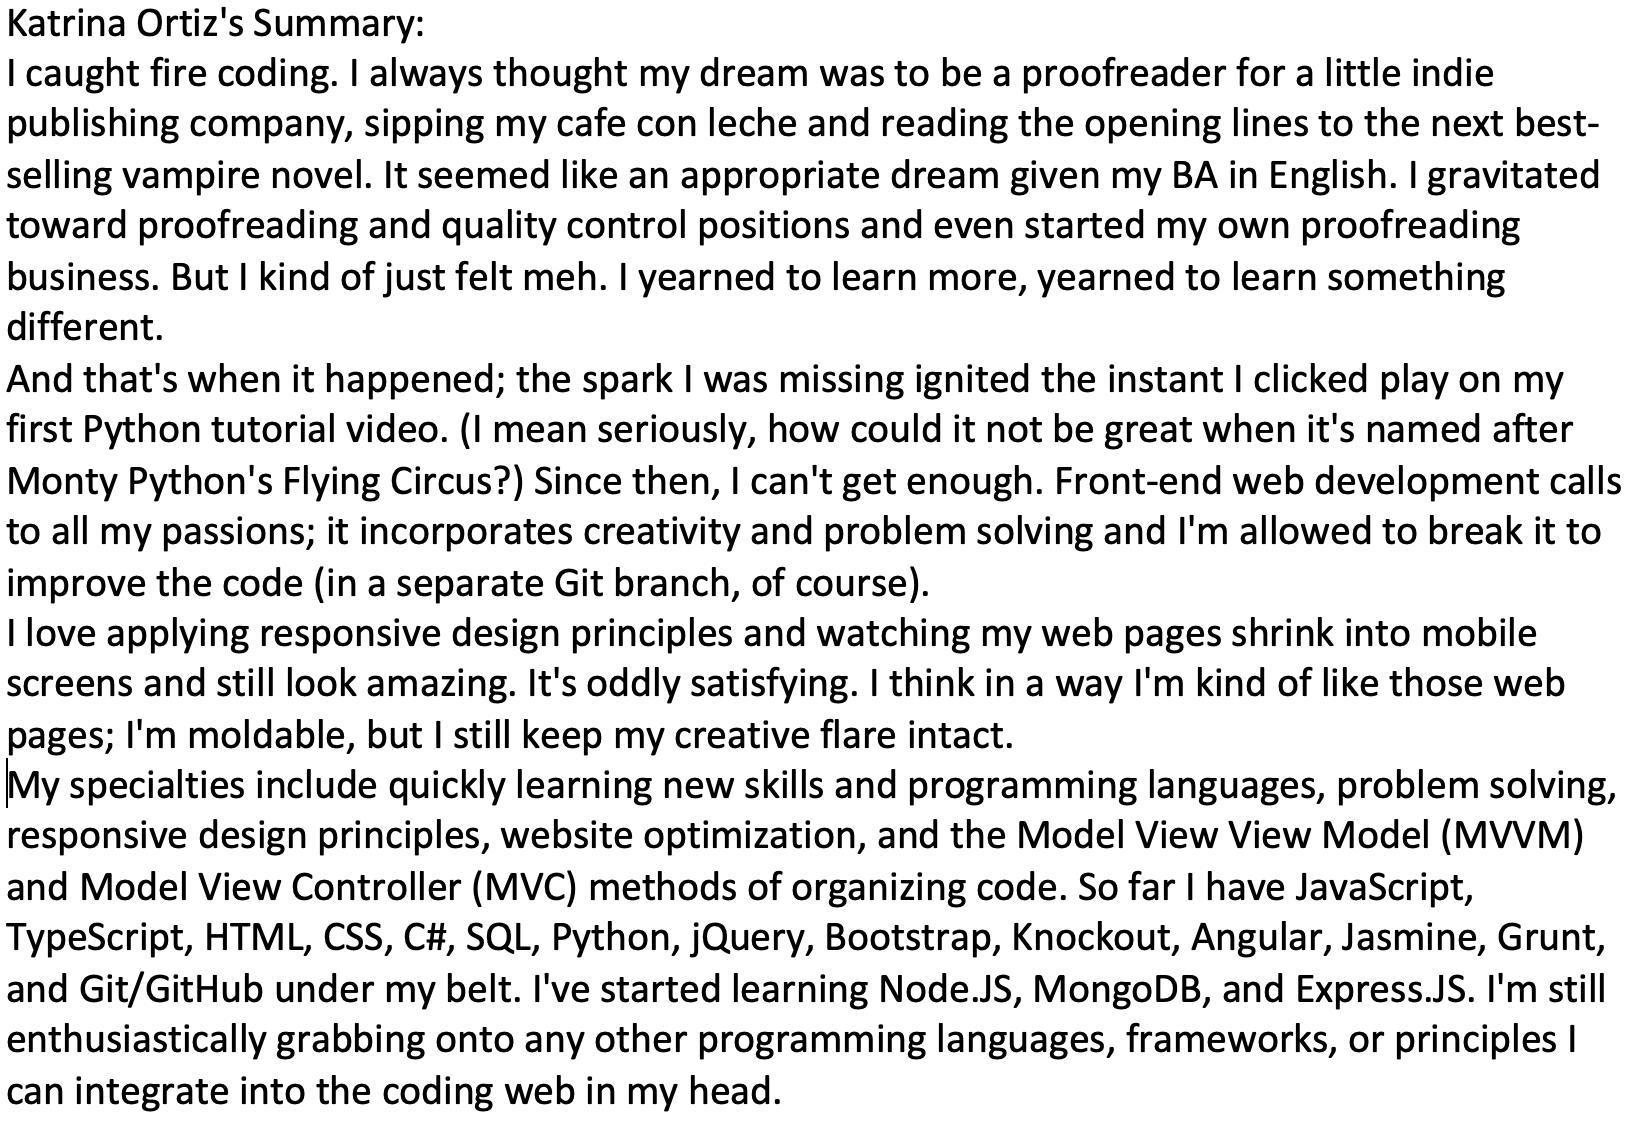 how to write a summary for a linkedin profile